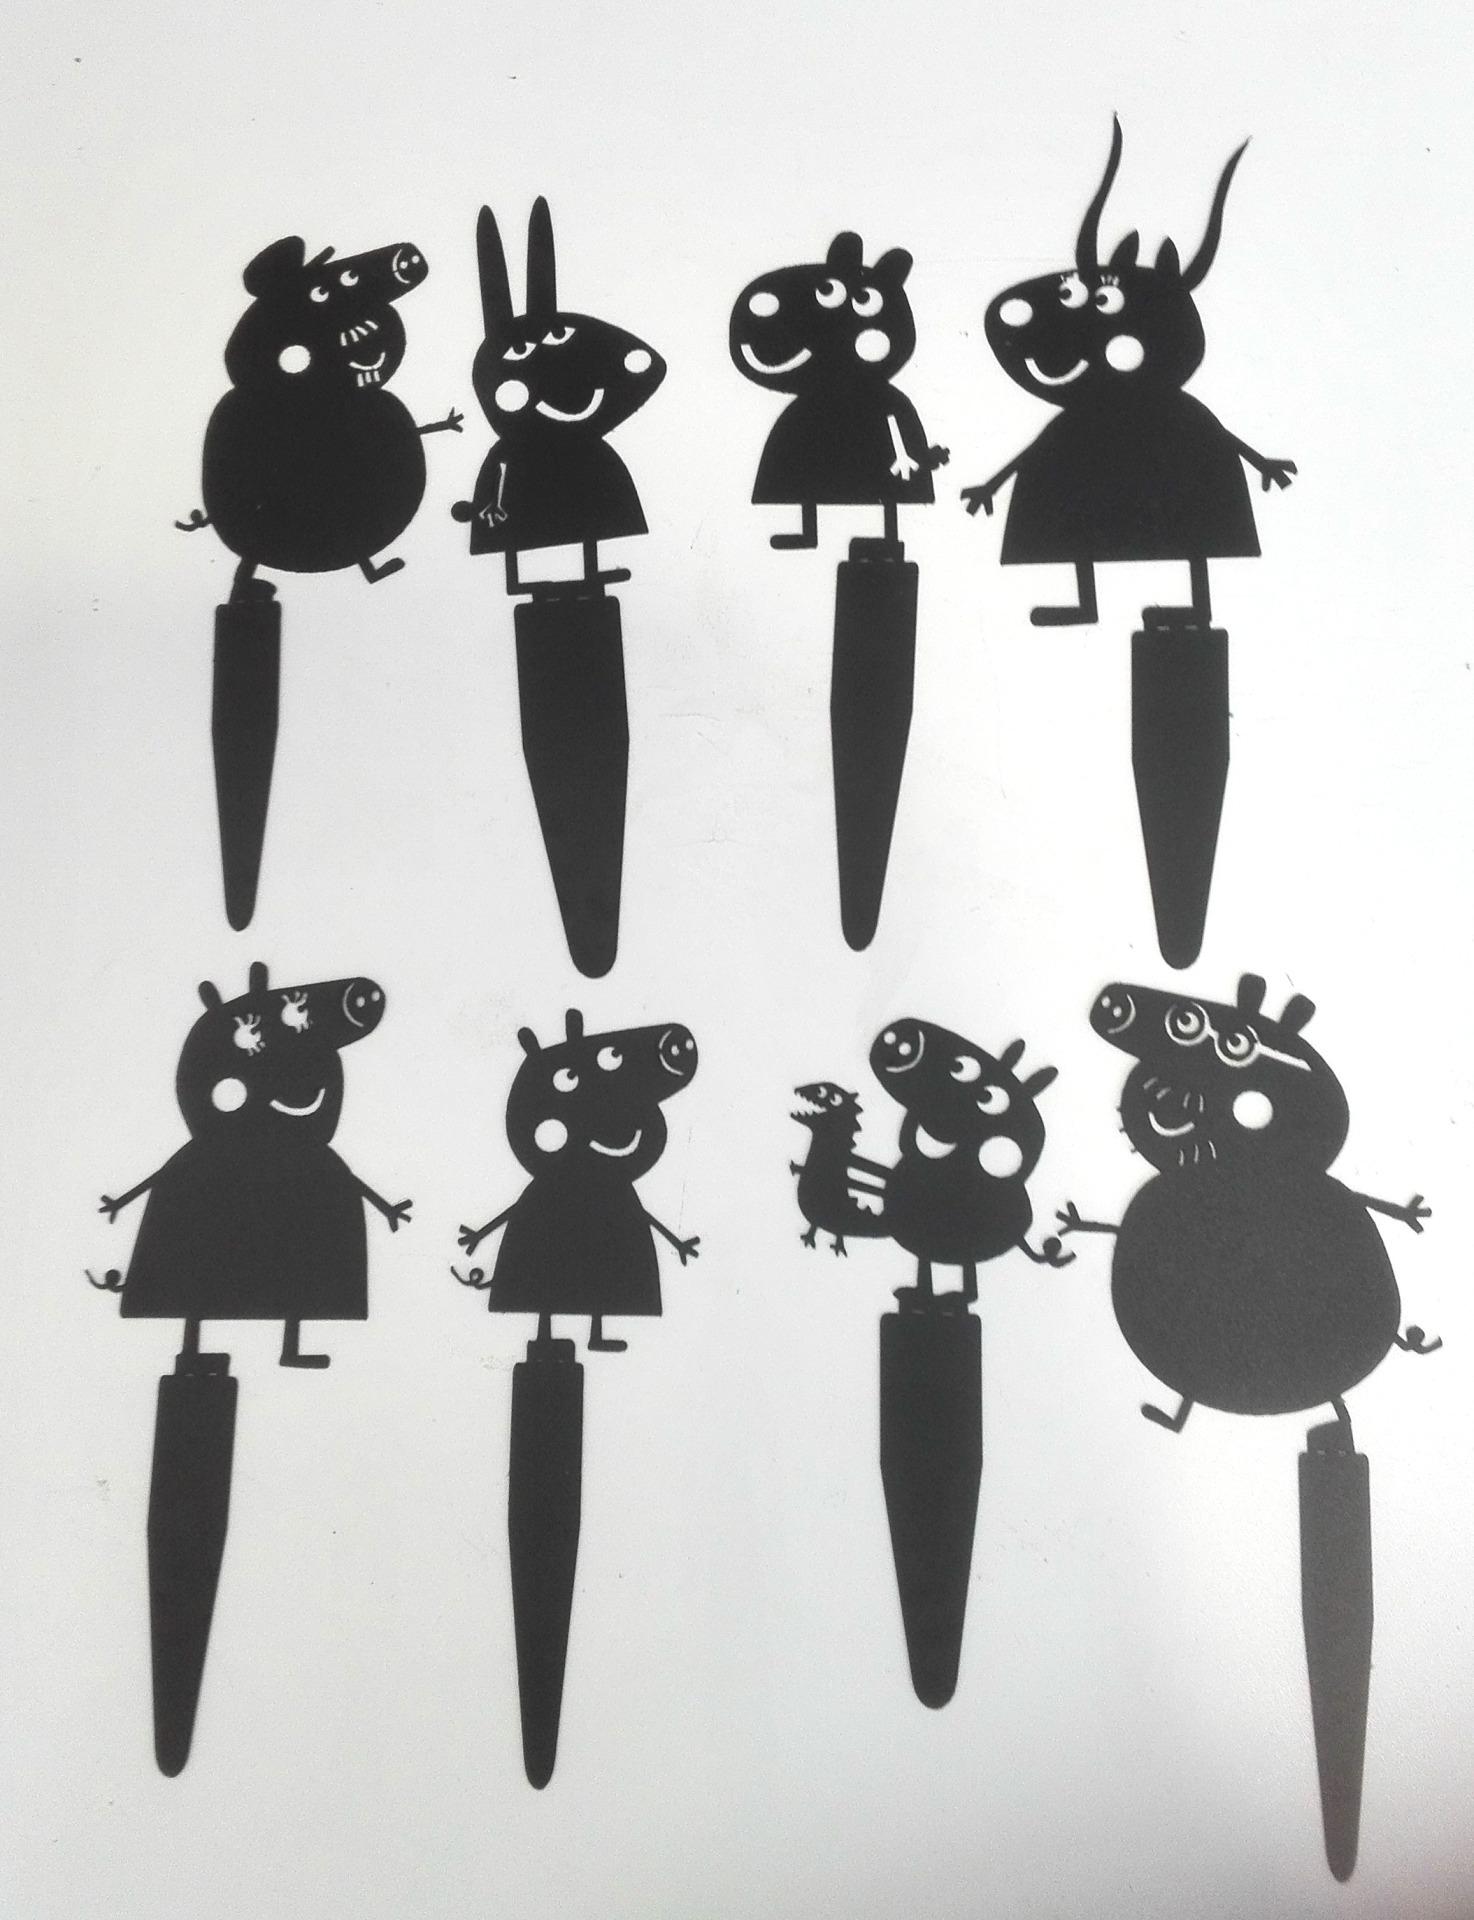 Свинка Пеппа набор для театра теней